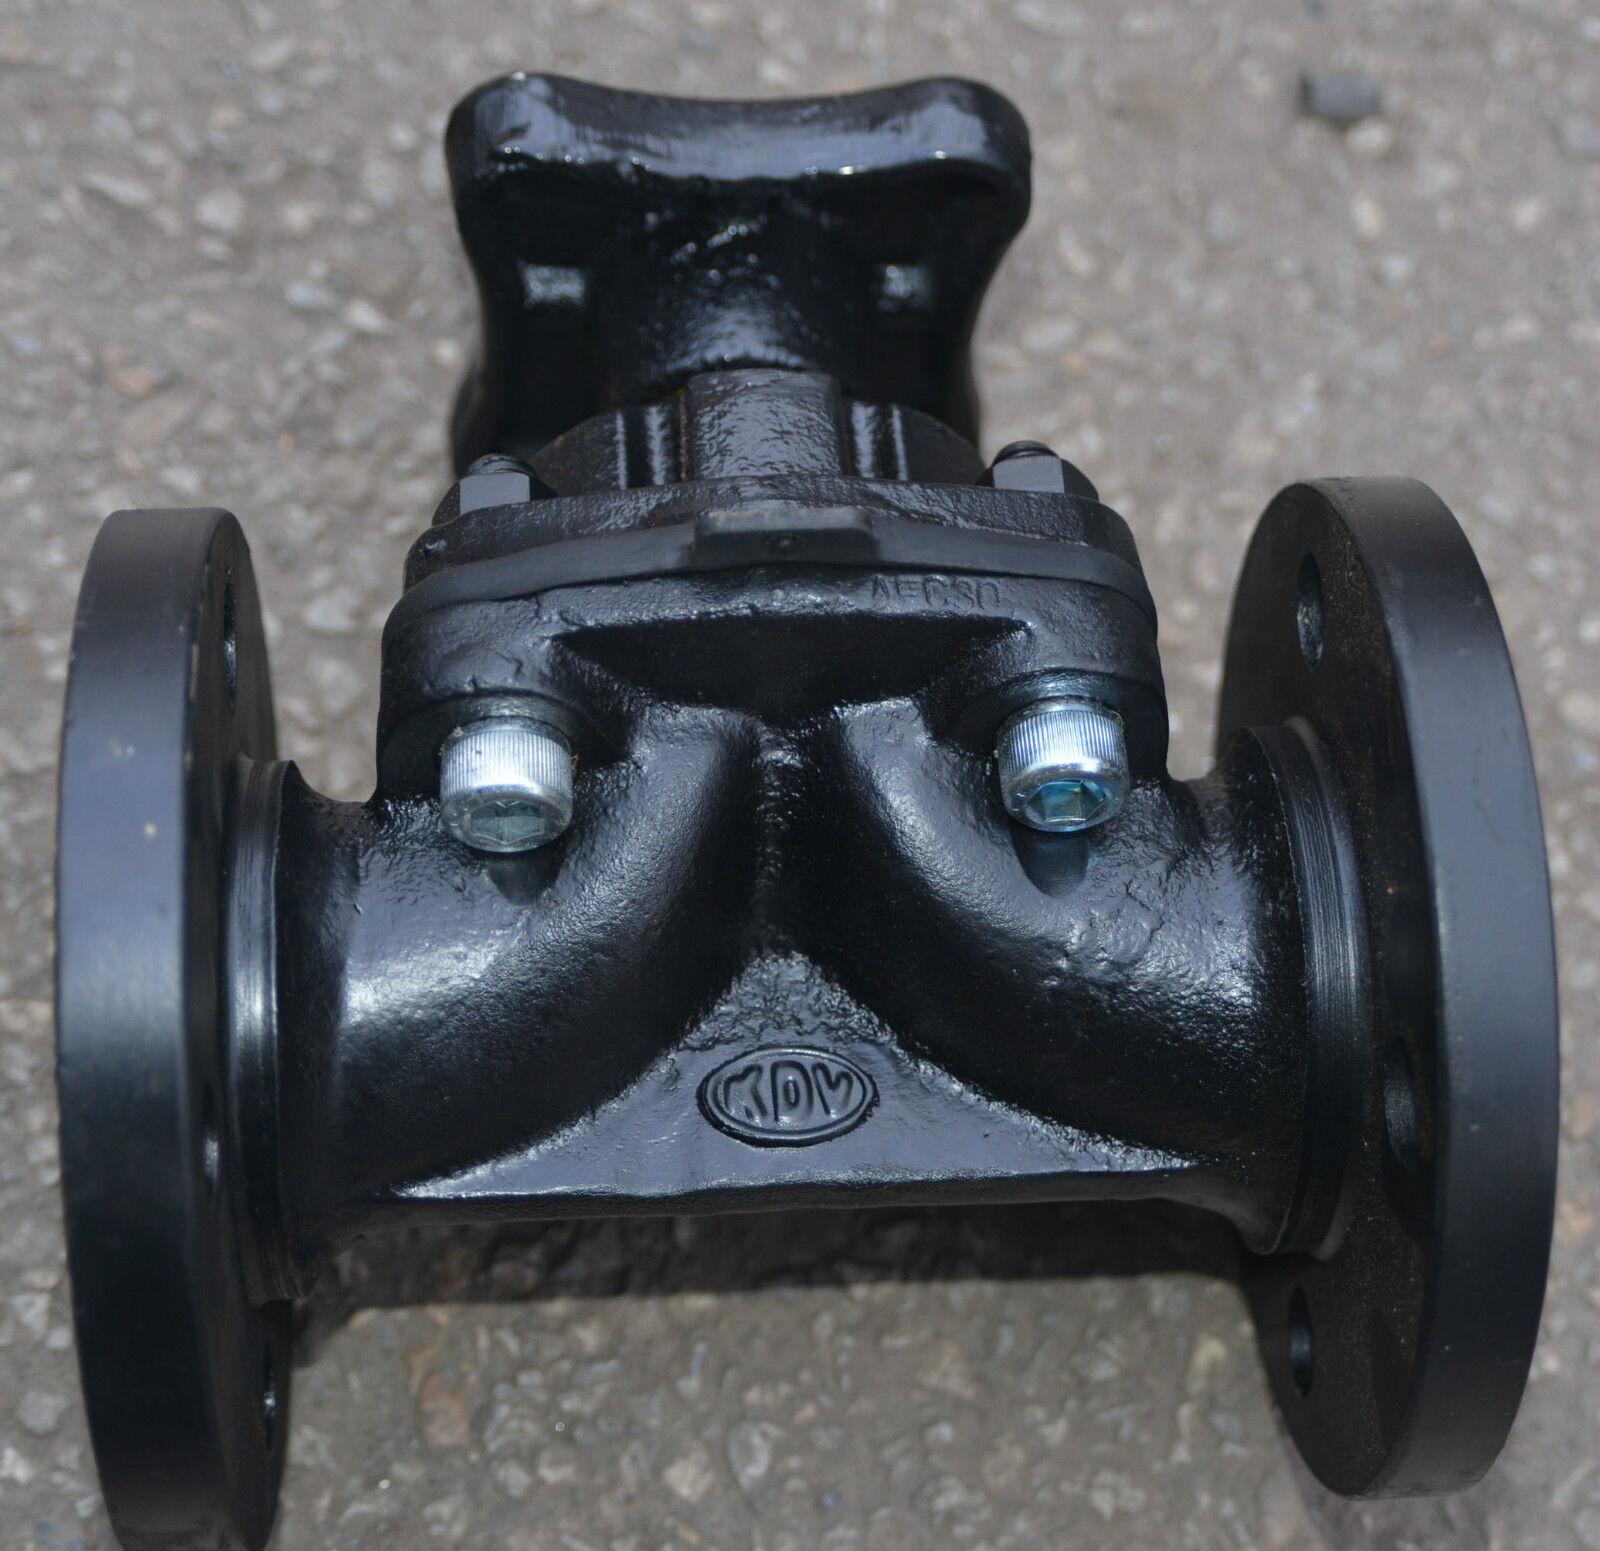 Kdv 2 in dn50 pn 16 diaphragm valve 6406 12660 picclick uk 9 of 12 kdv 2 in dn50 pn 16 diaphragm valve 6406 10 of 12 kdv 2 in dn50 pn 16 diaphragm valve ccuart Gallery